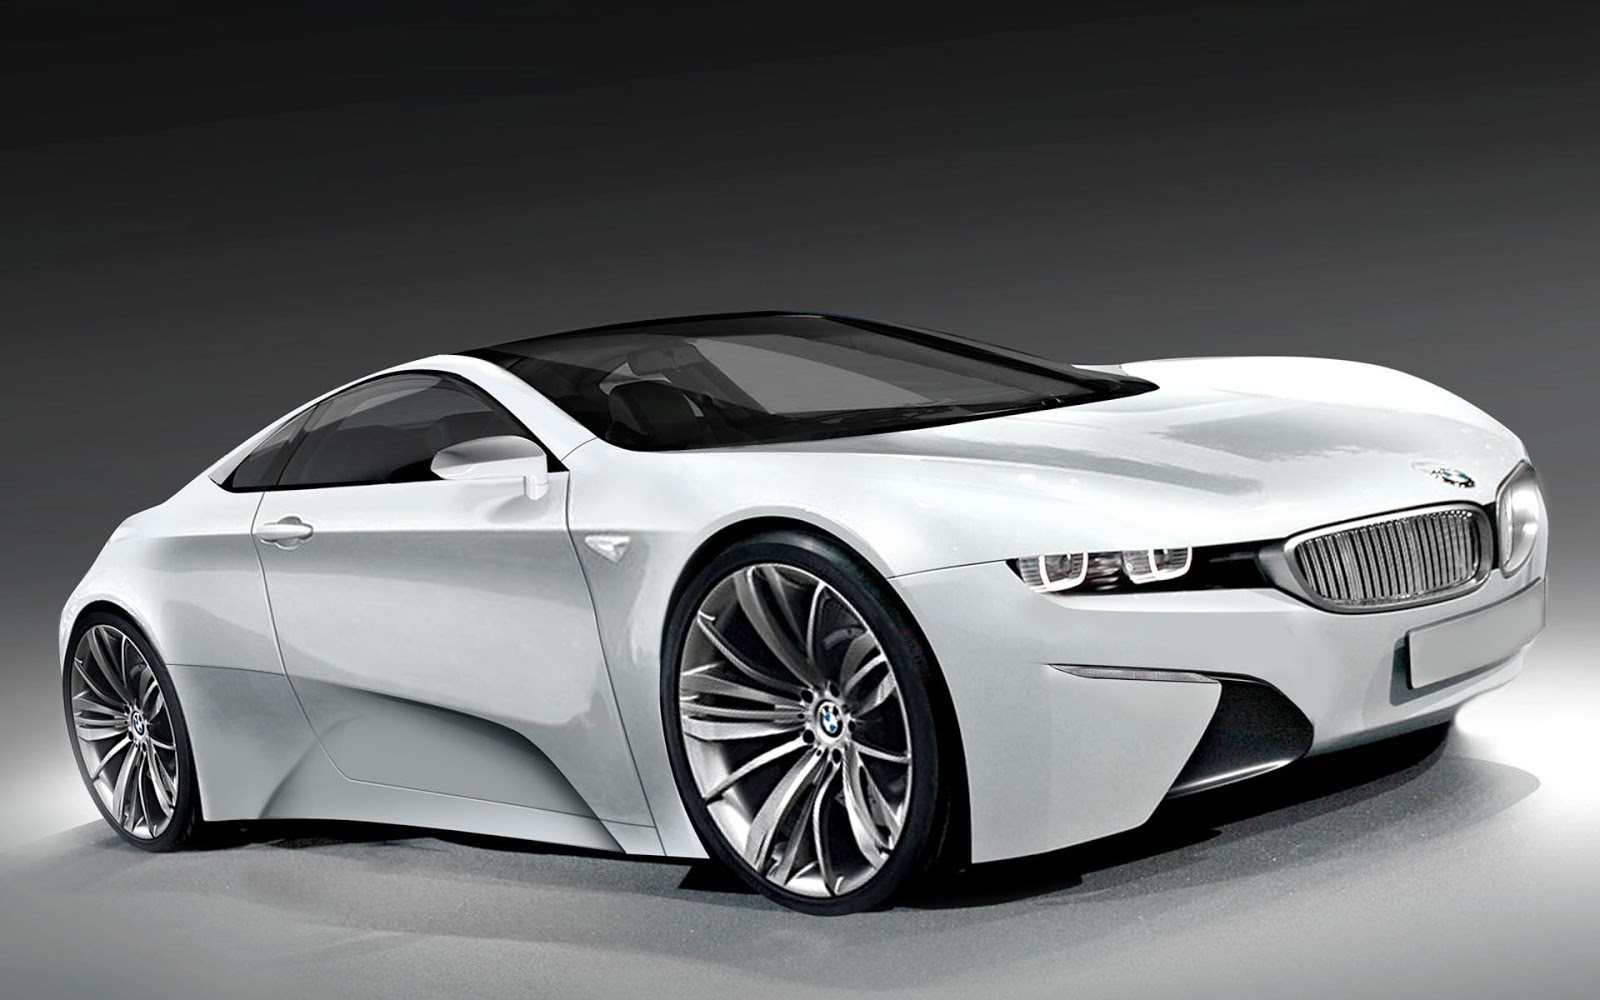 New BMW I8 Sports Car